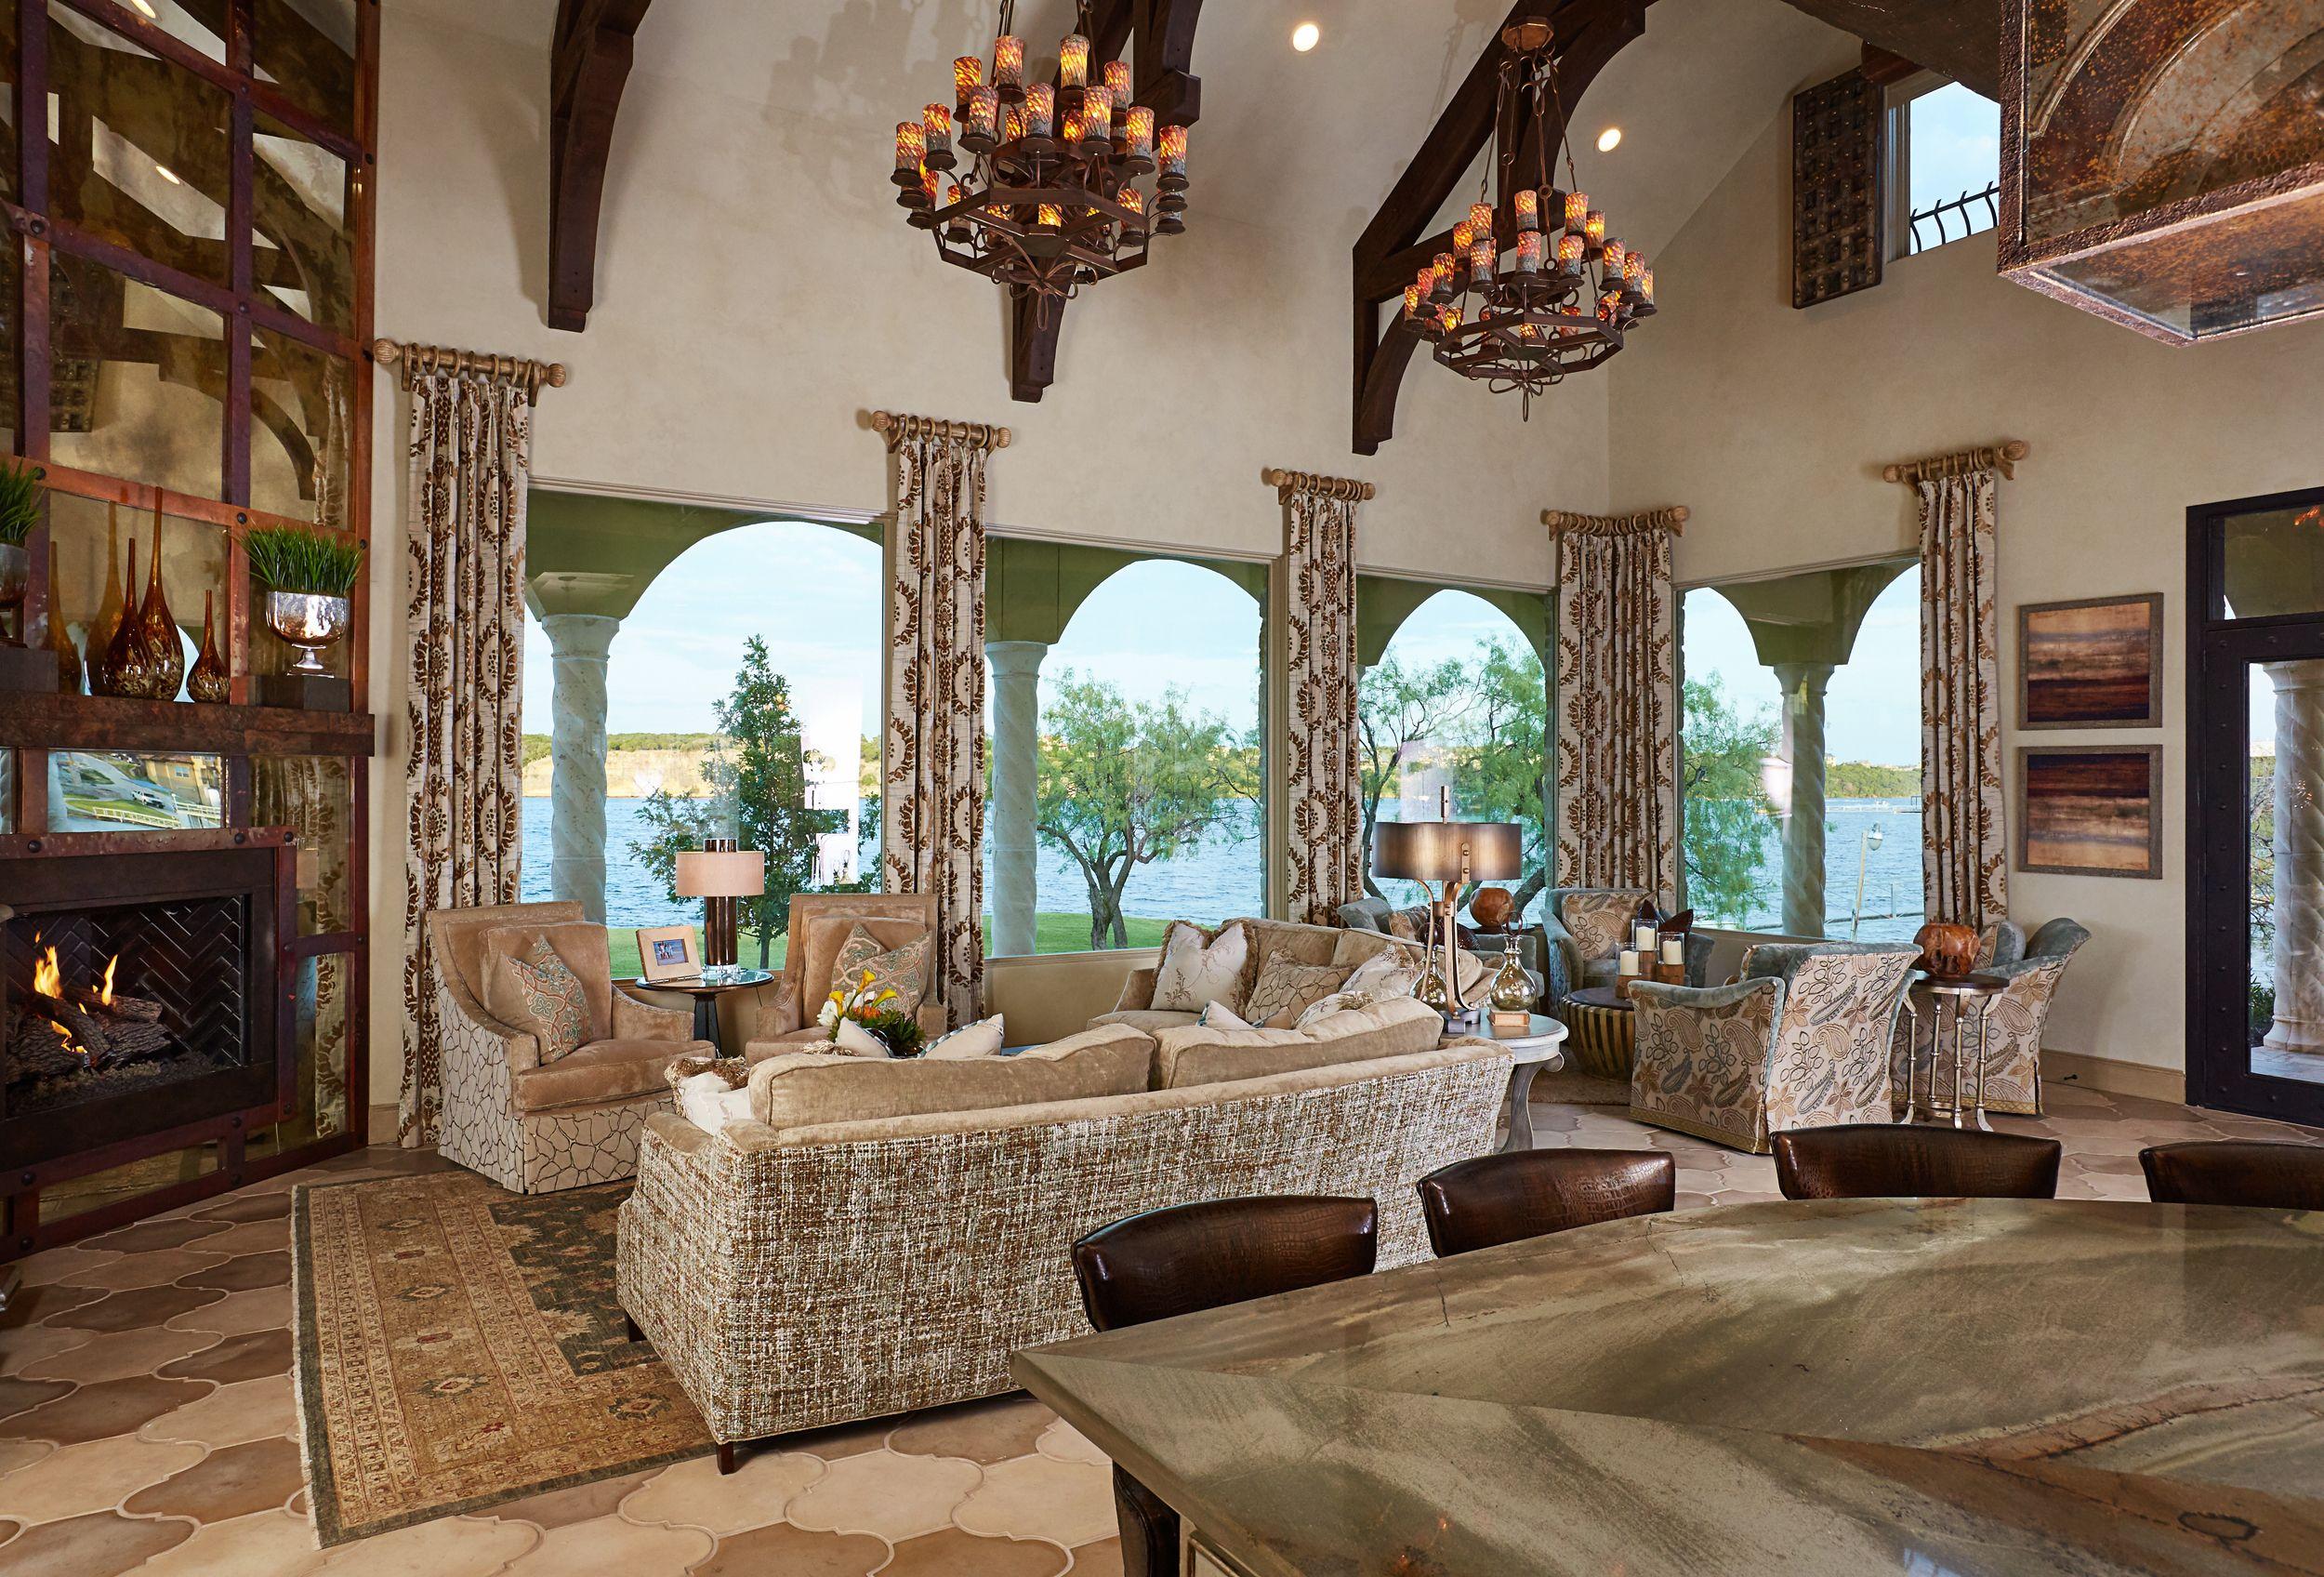 Italian Villa Interior Design Grandeur Draperies Pinterest